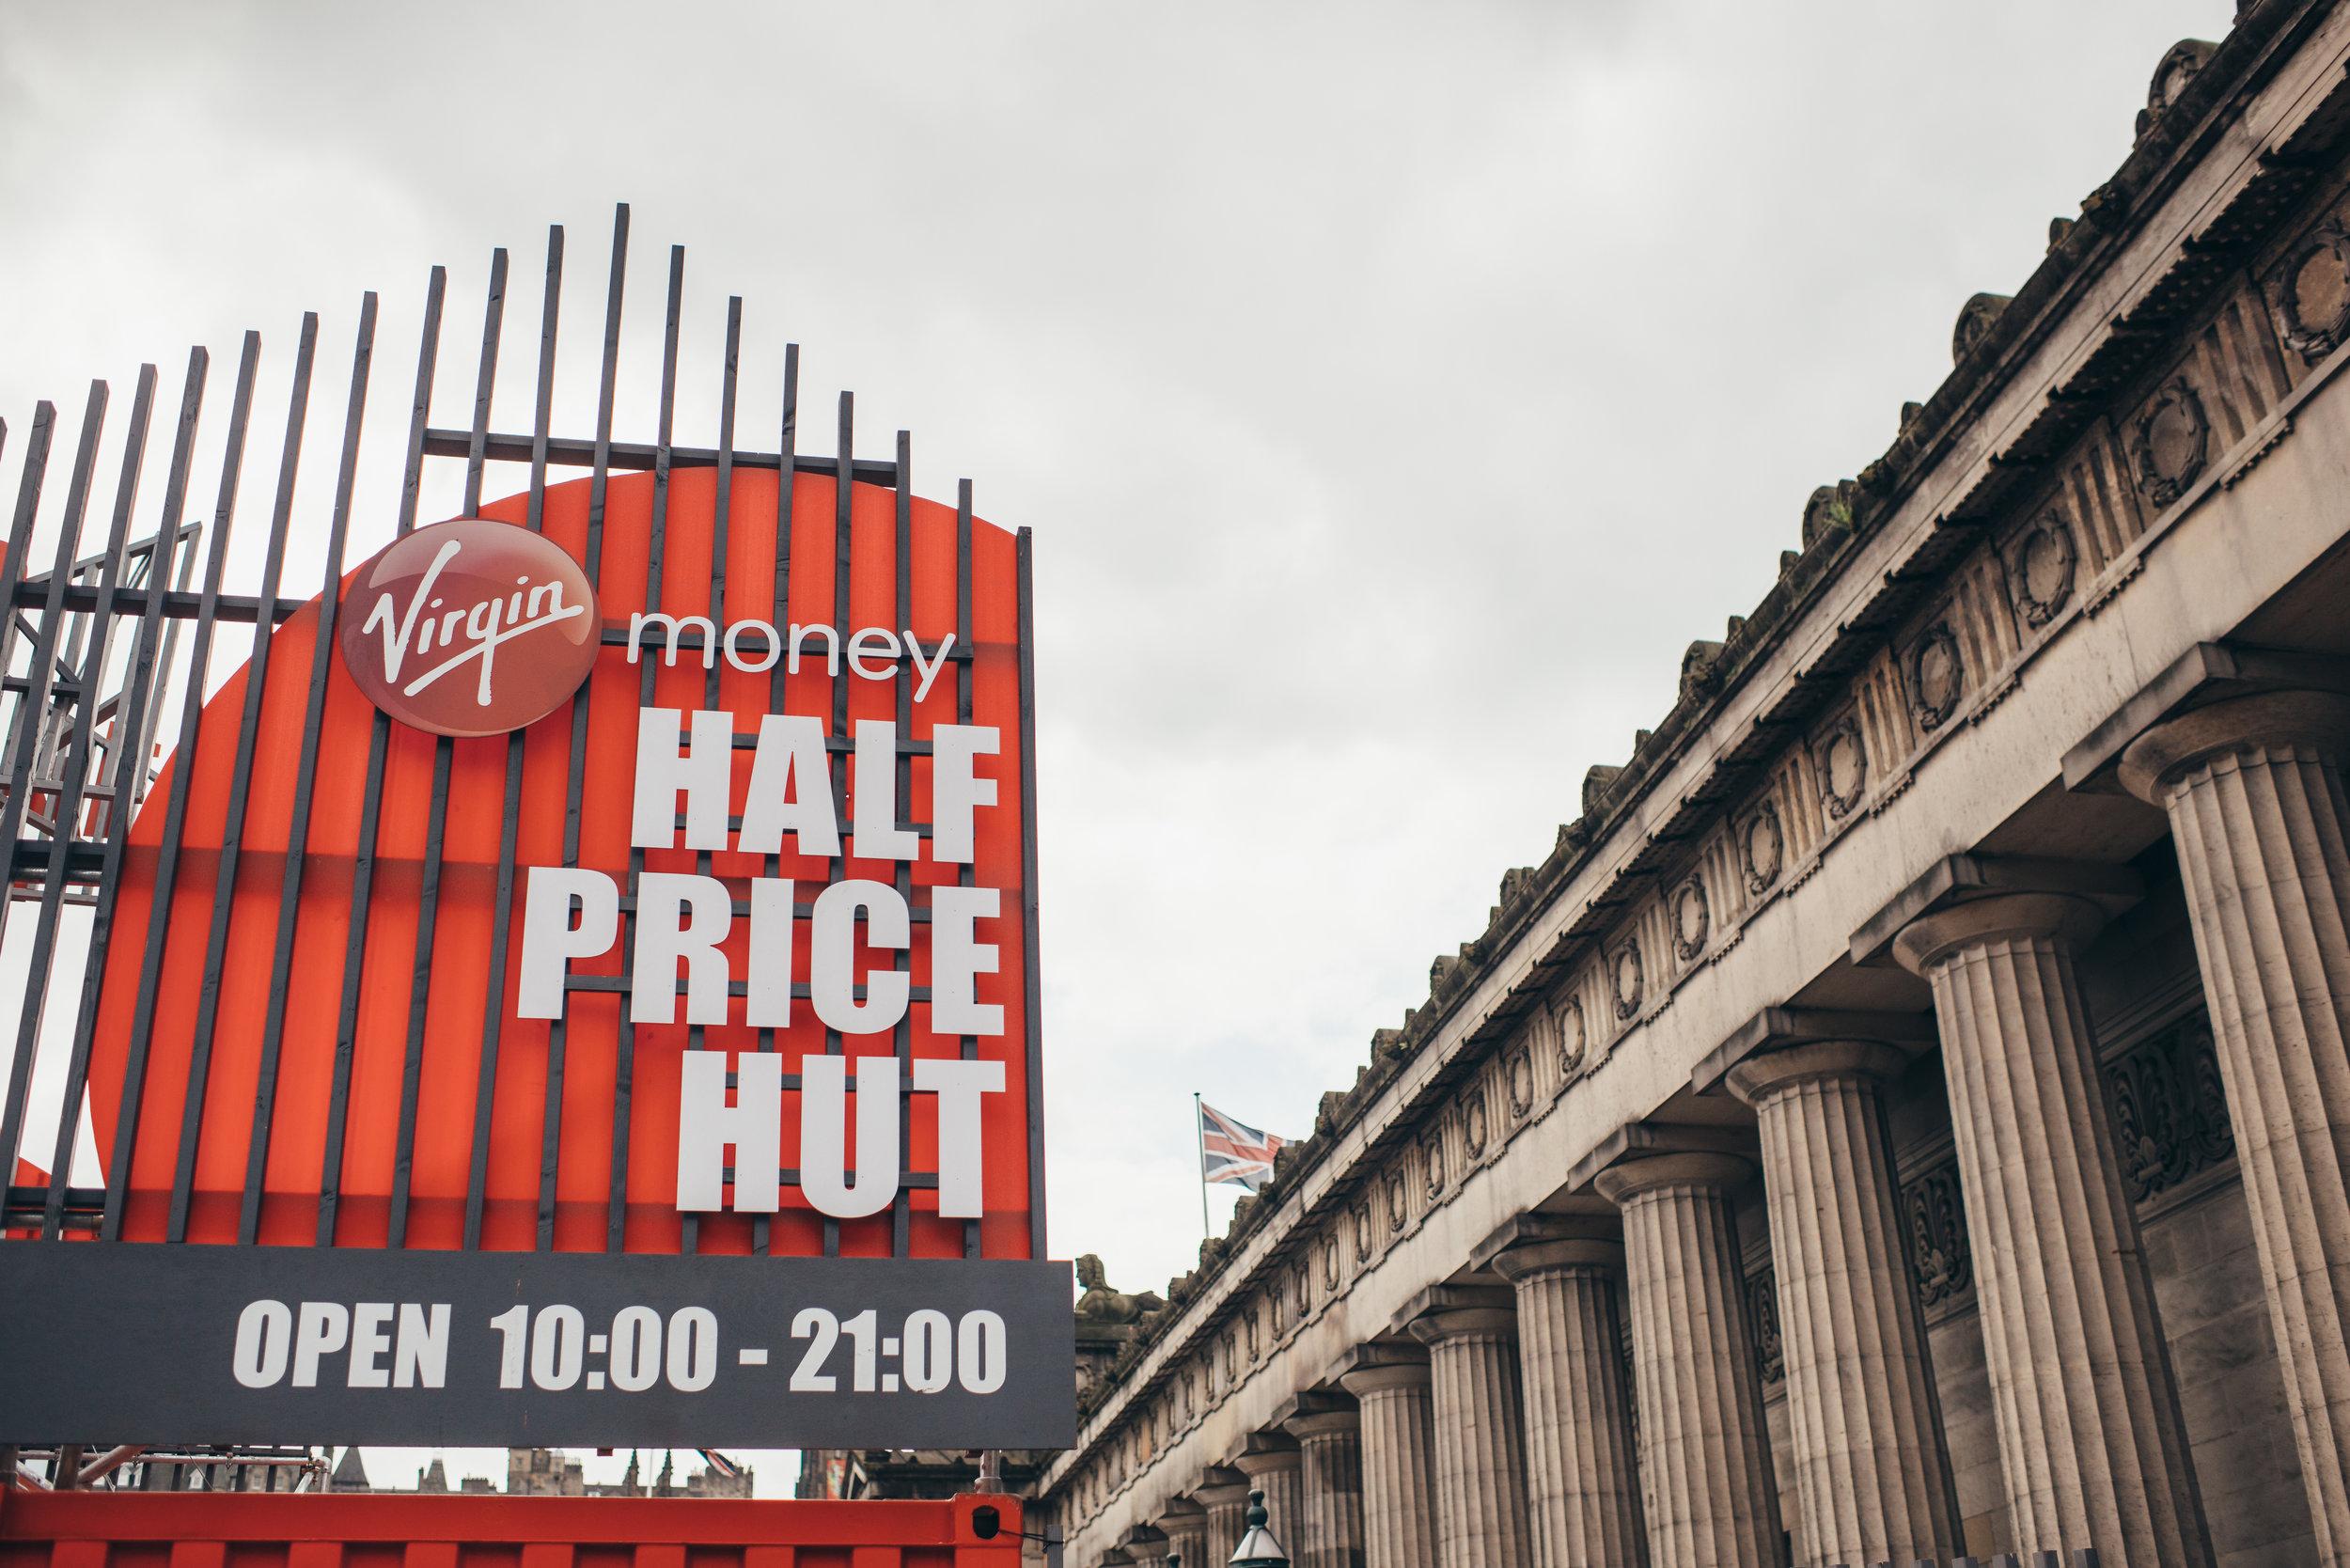 Entrance to Virgin Money Half Price Hut